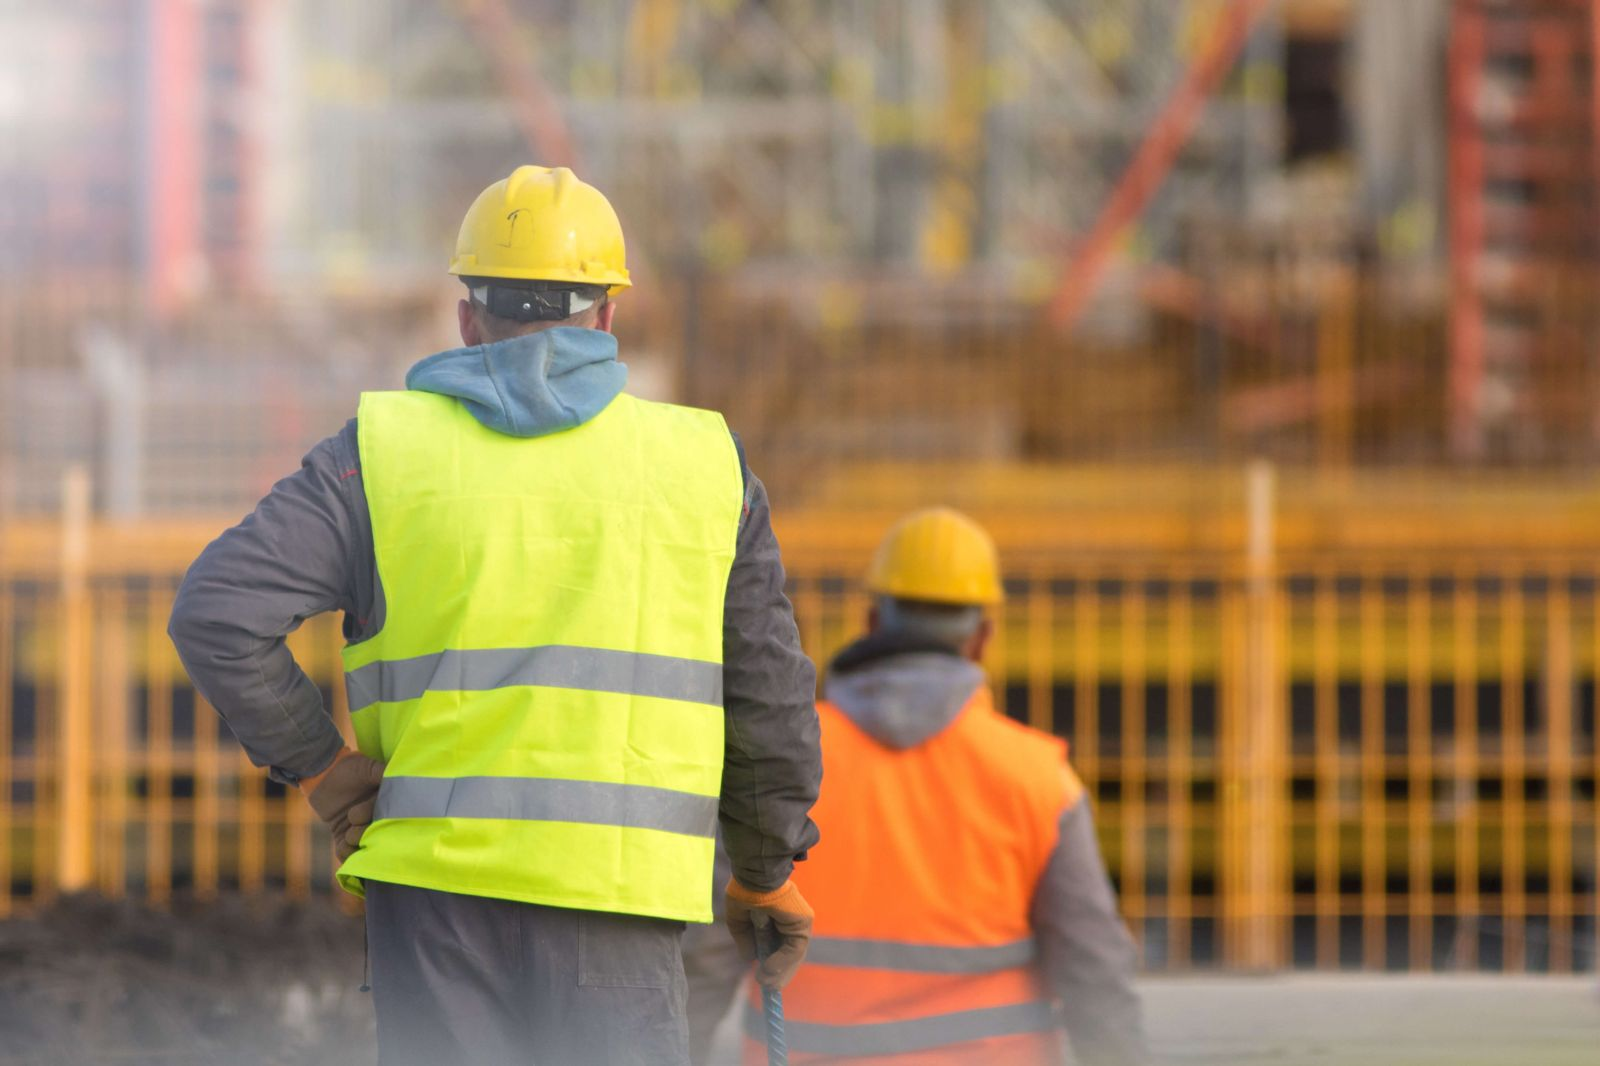 Construction Injury Neblett, Beard and Arsenault